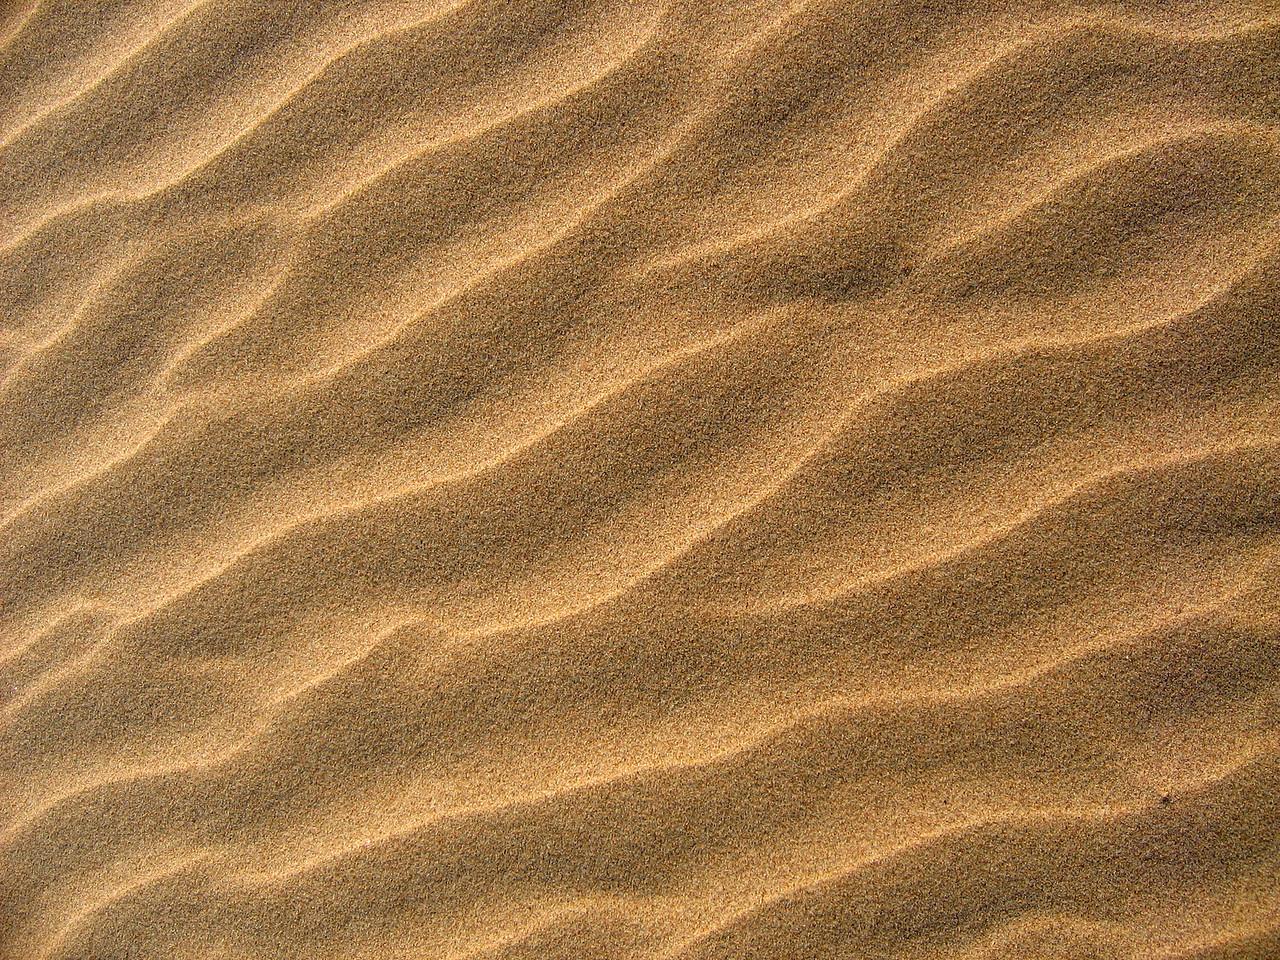 A lil' bit of Texas beach.